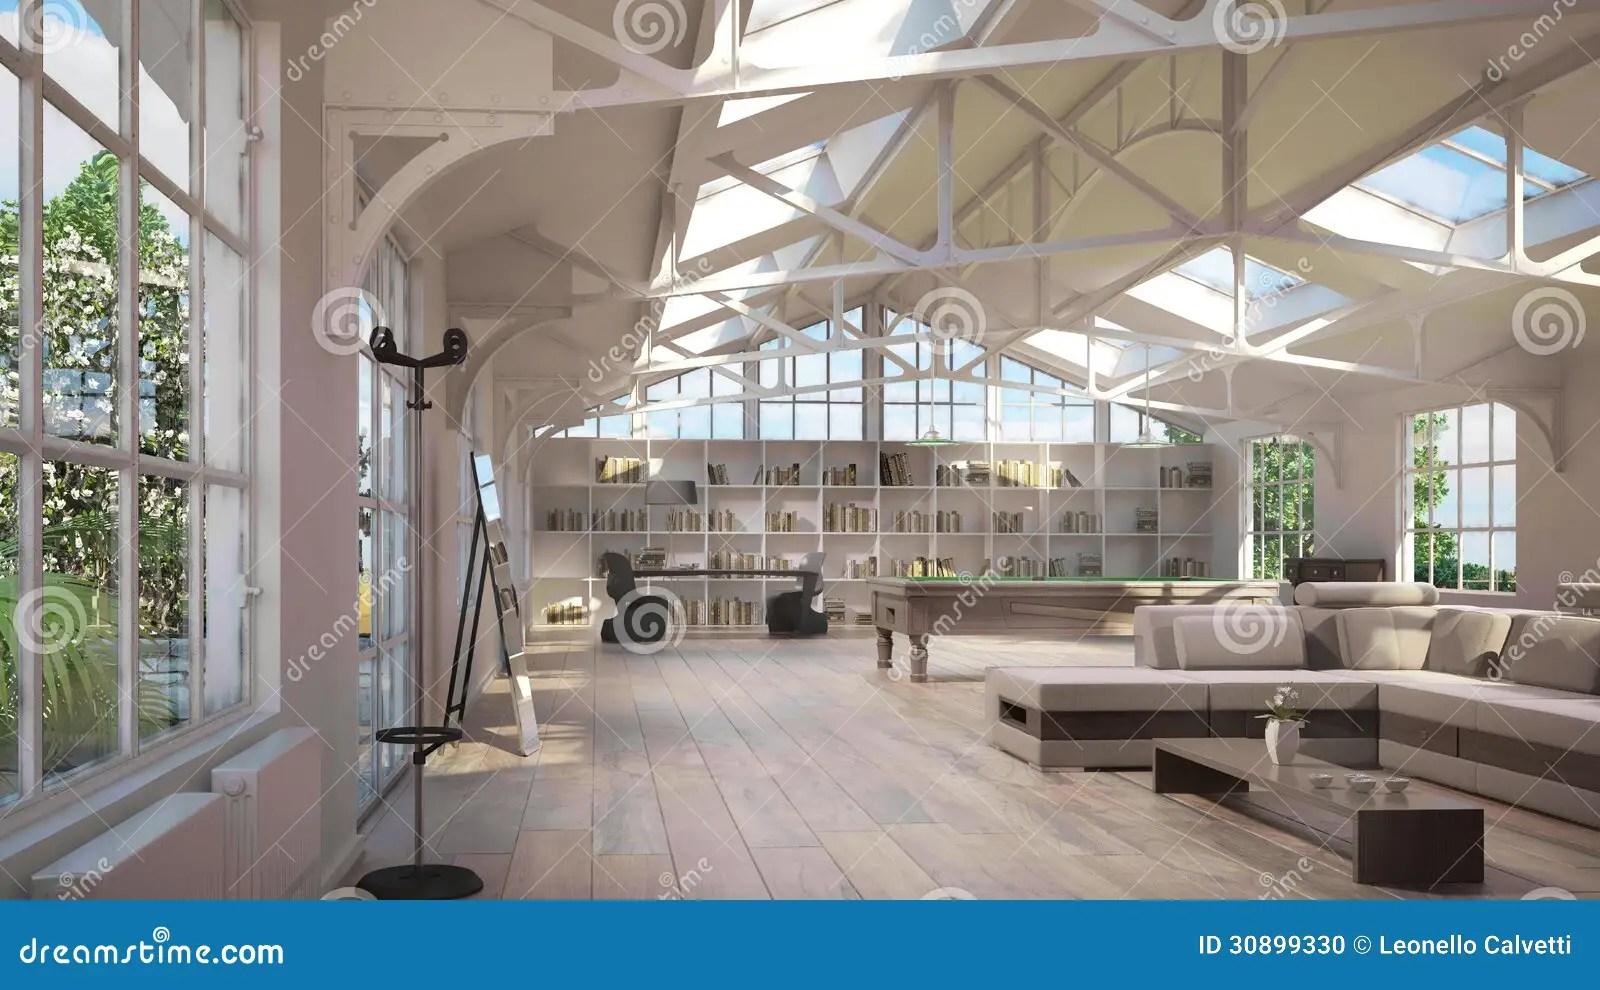 Luxury Loft Interiors Stock Photo Image 30899330